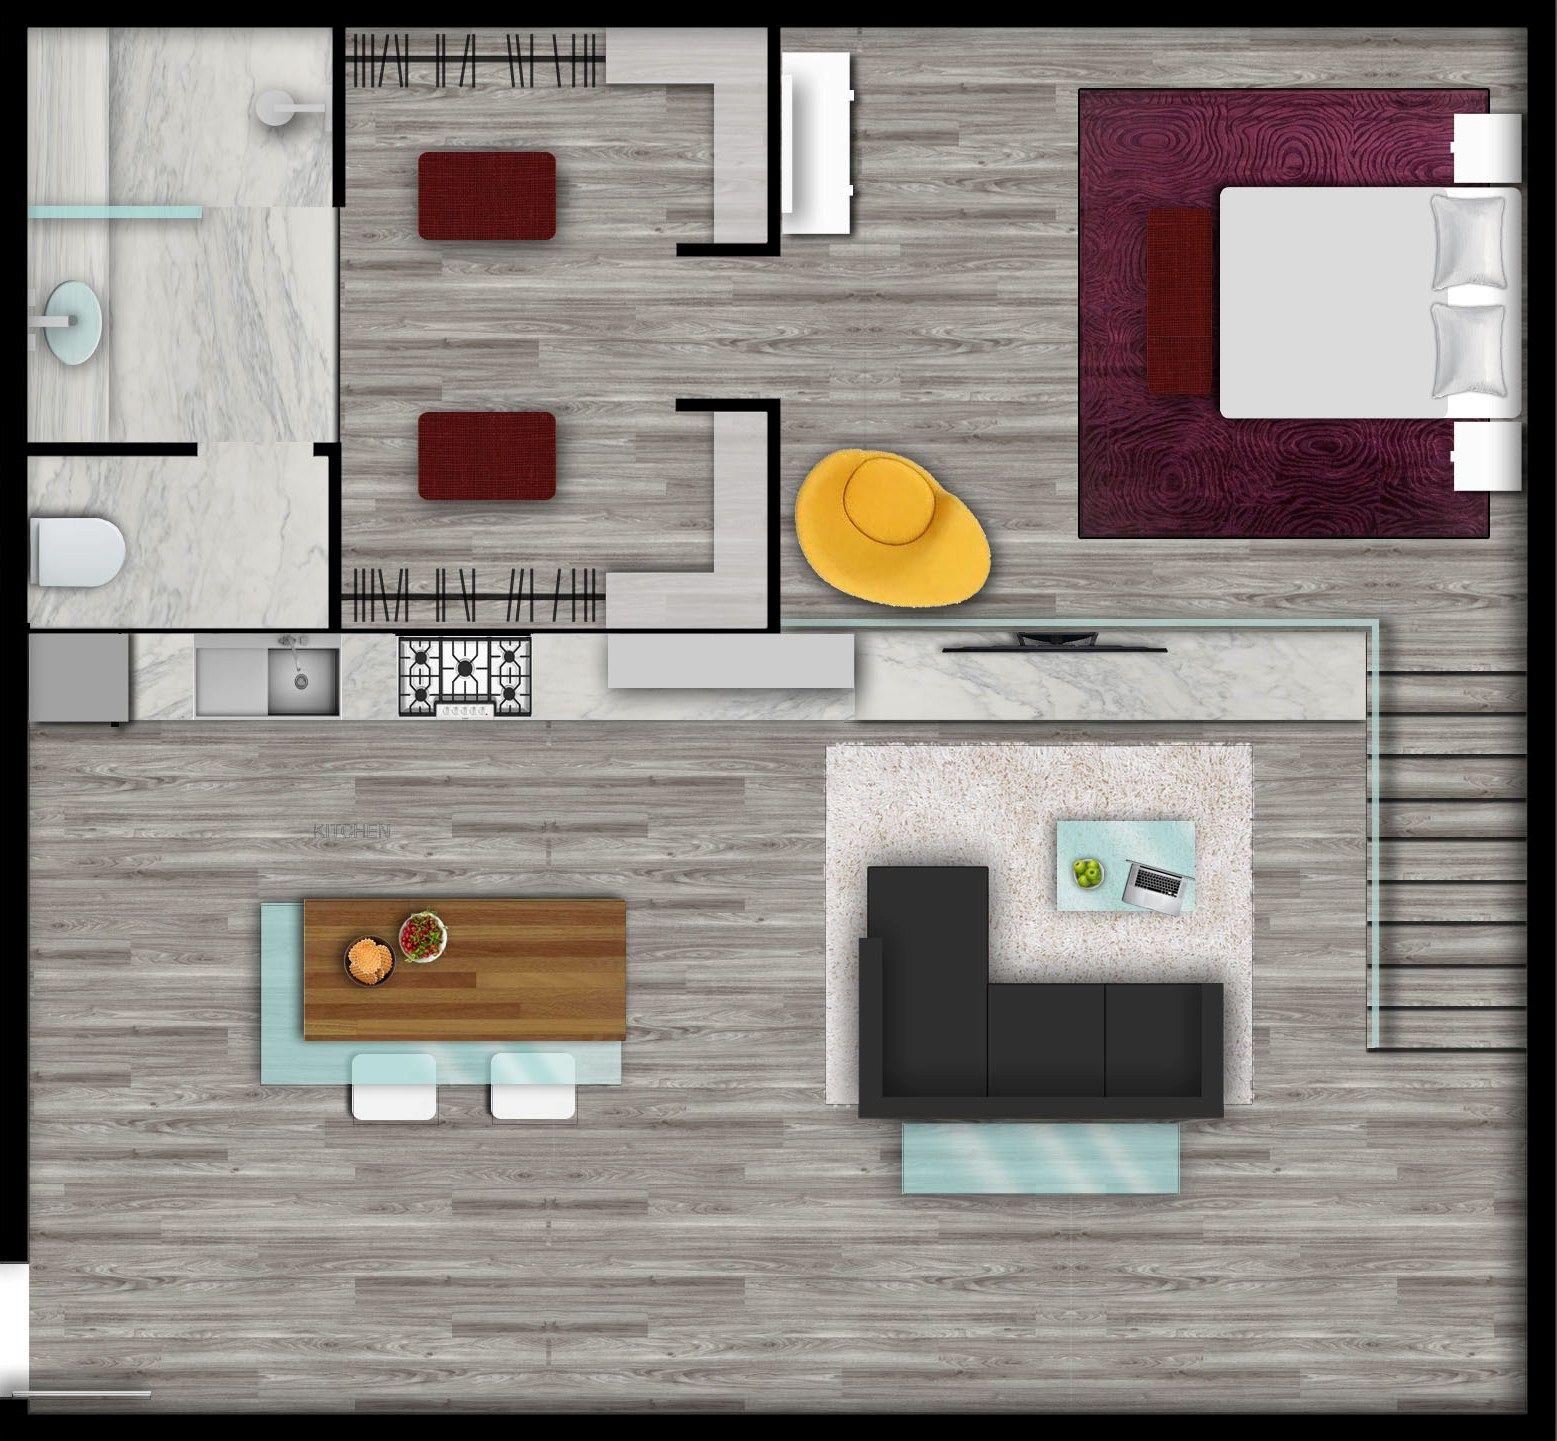 Urban Style Loft Floor Plan Rendered By E Render Loft Floor Plans Rendered Floor Plan Floor Plans